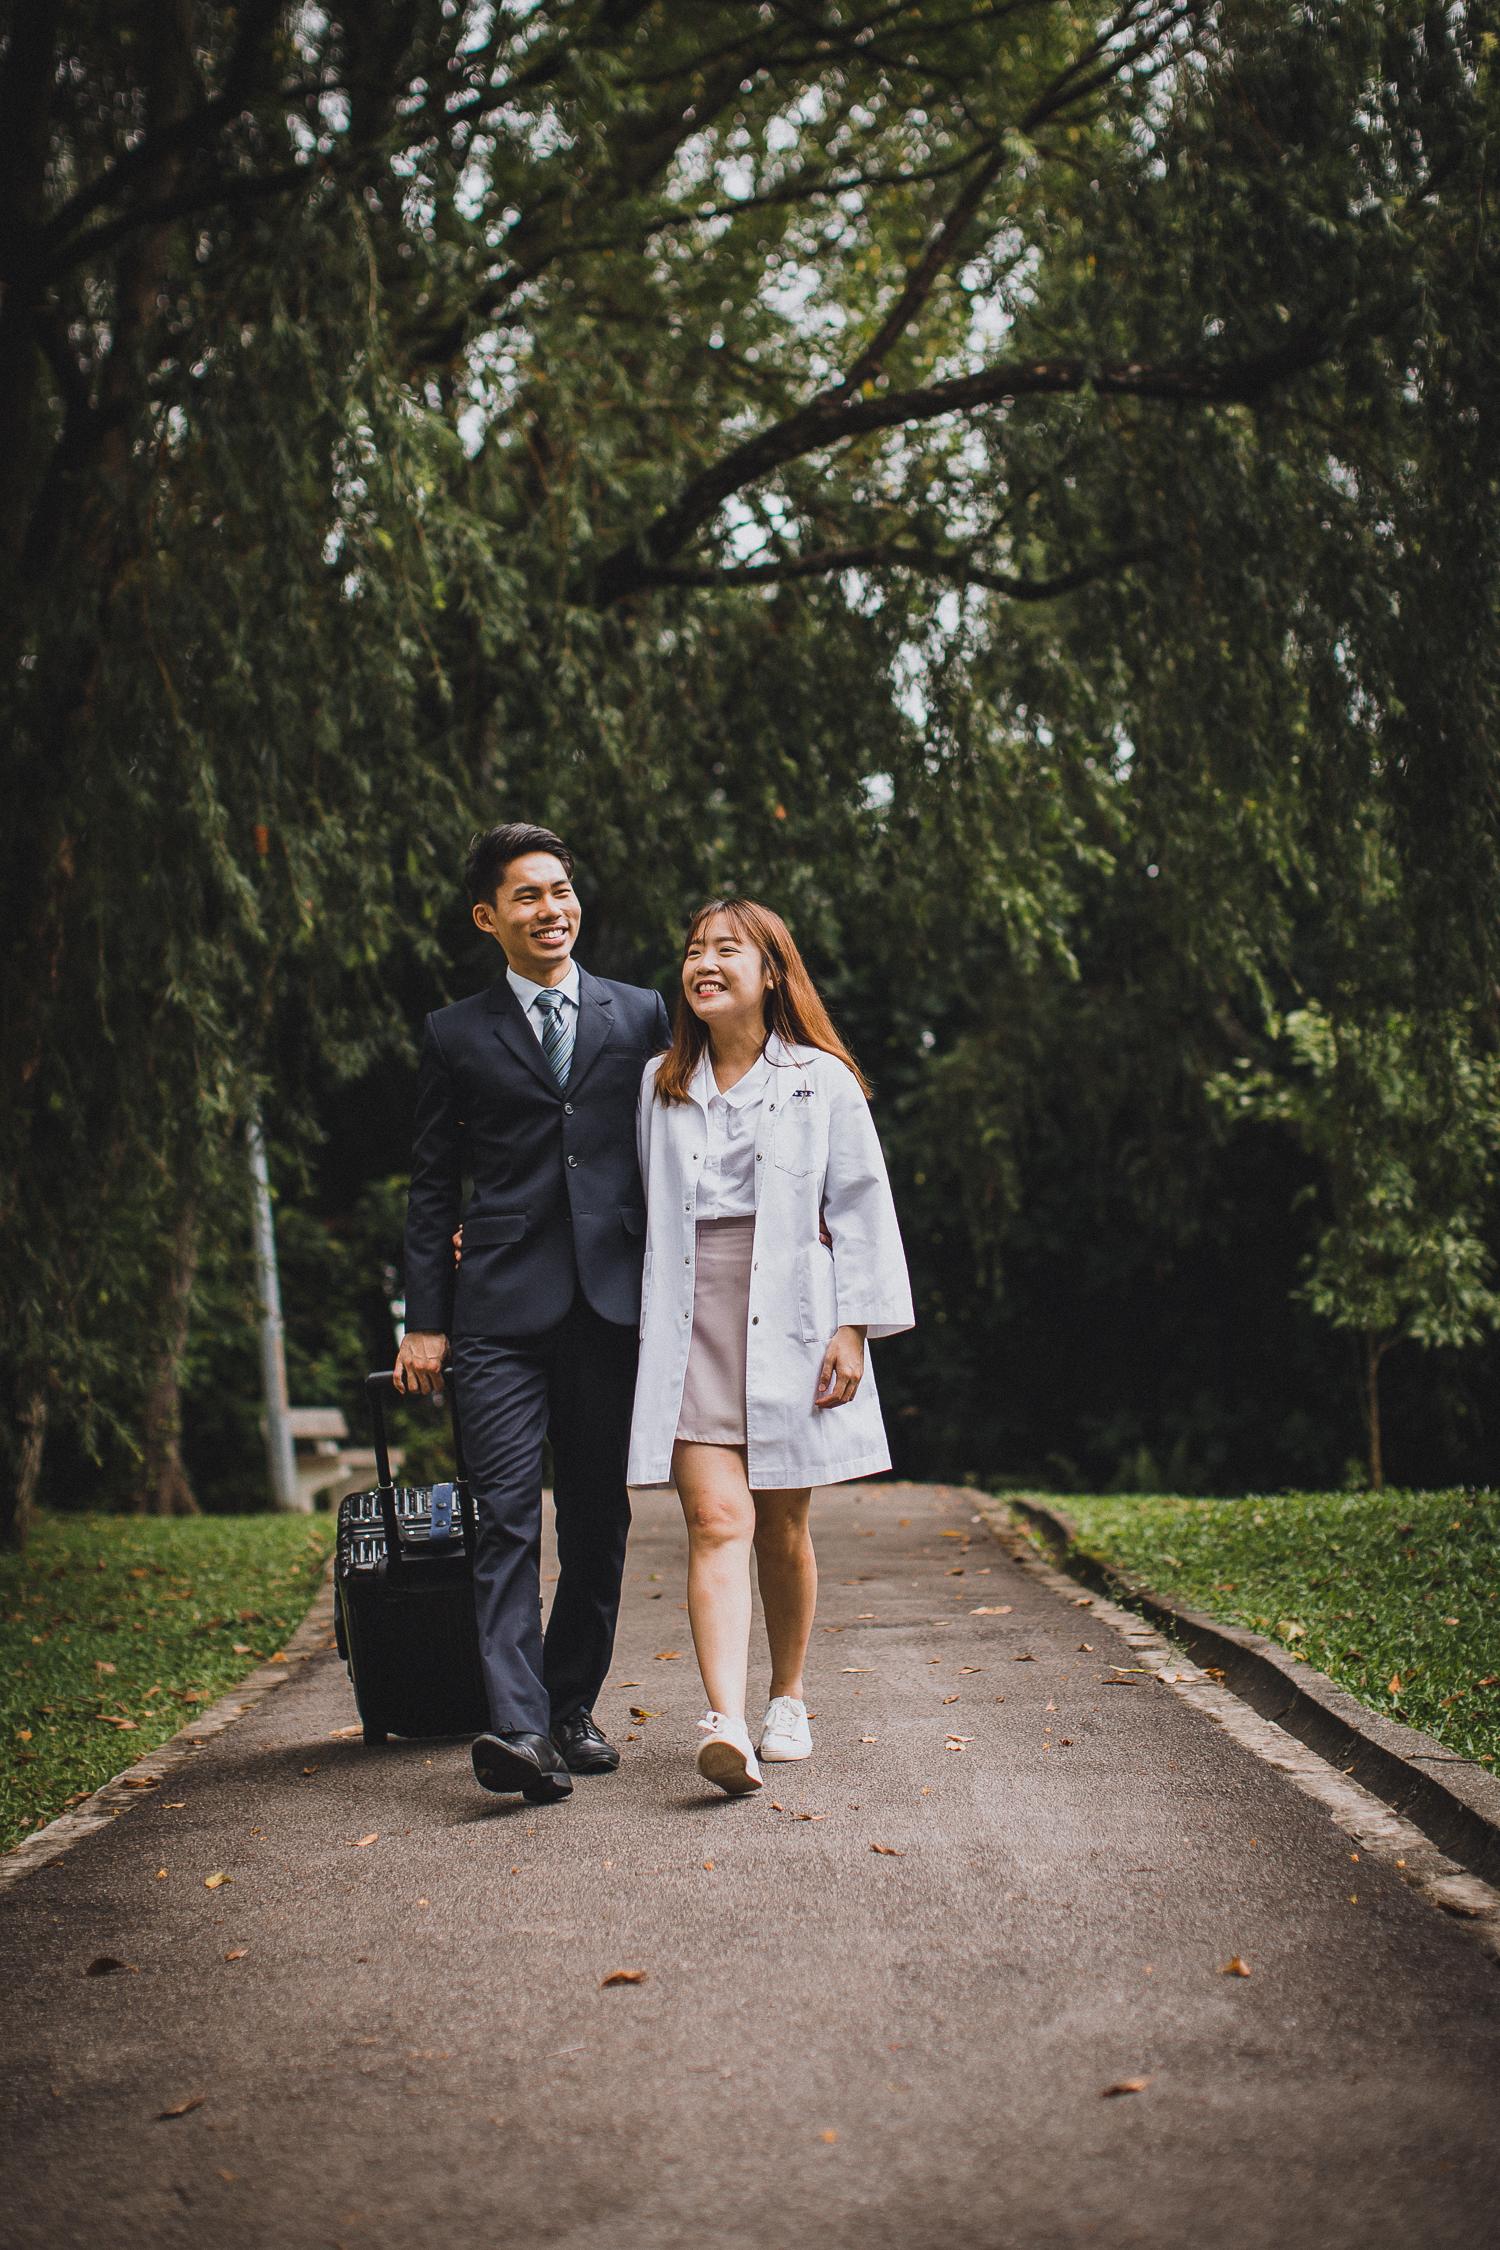 Singapore+Wedding+Photographer+Pre-Wedding+Couple+Zhiyu+Huimin-0032.jpg